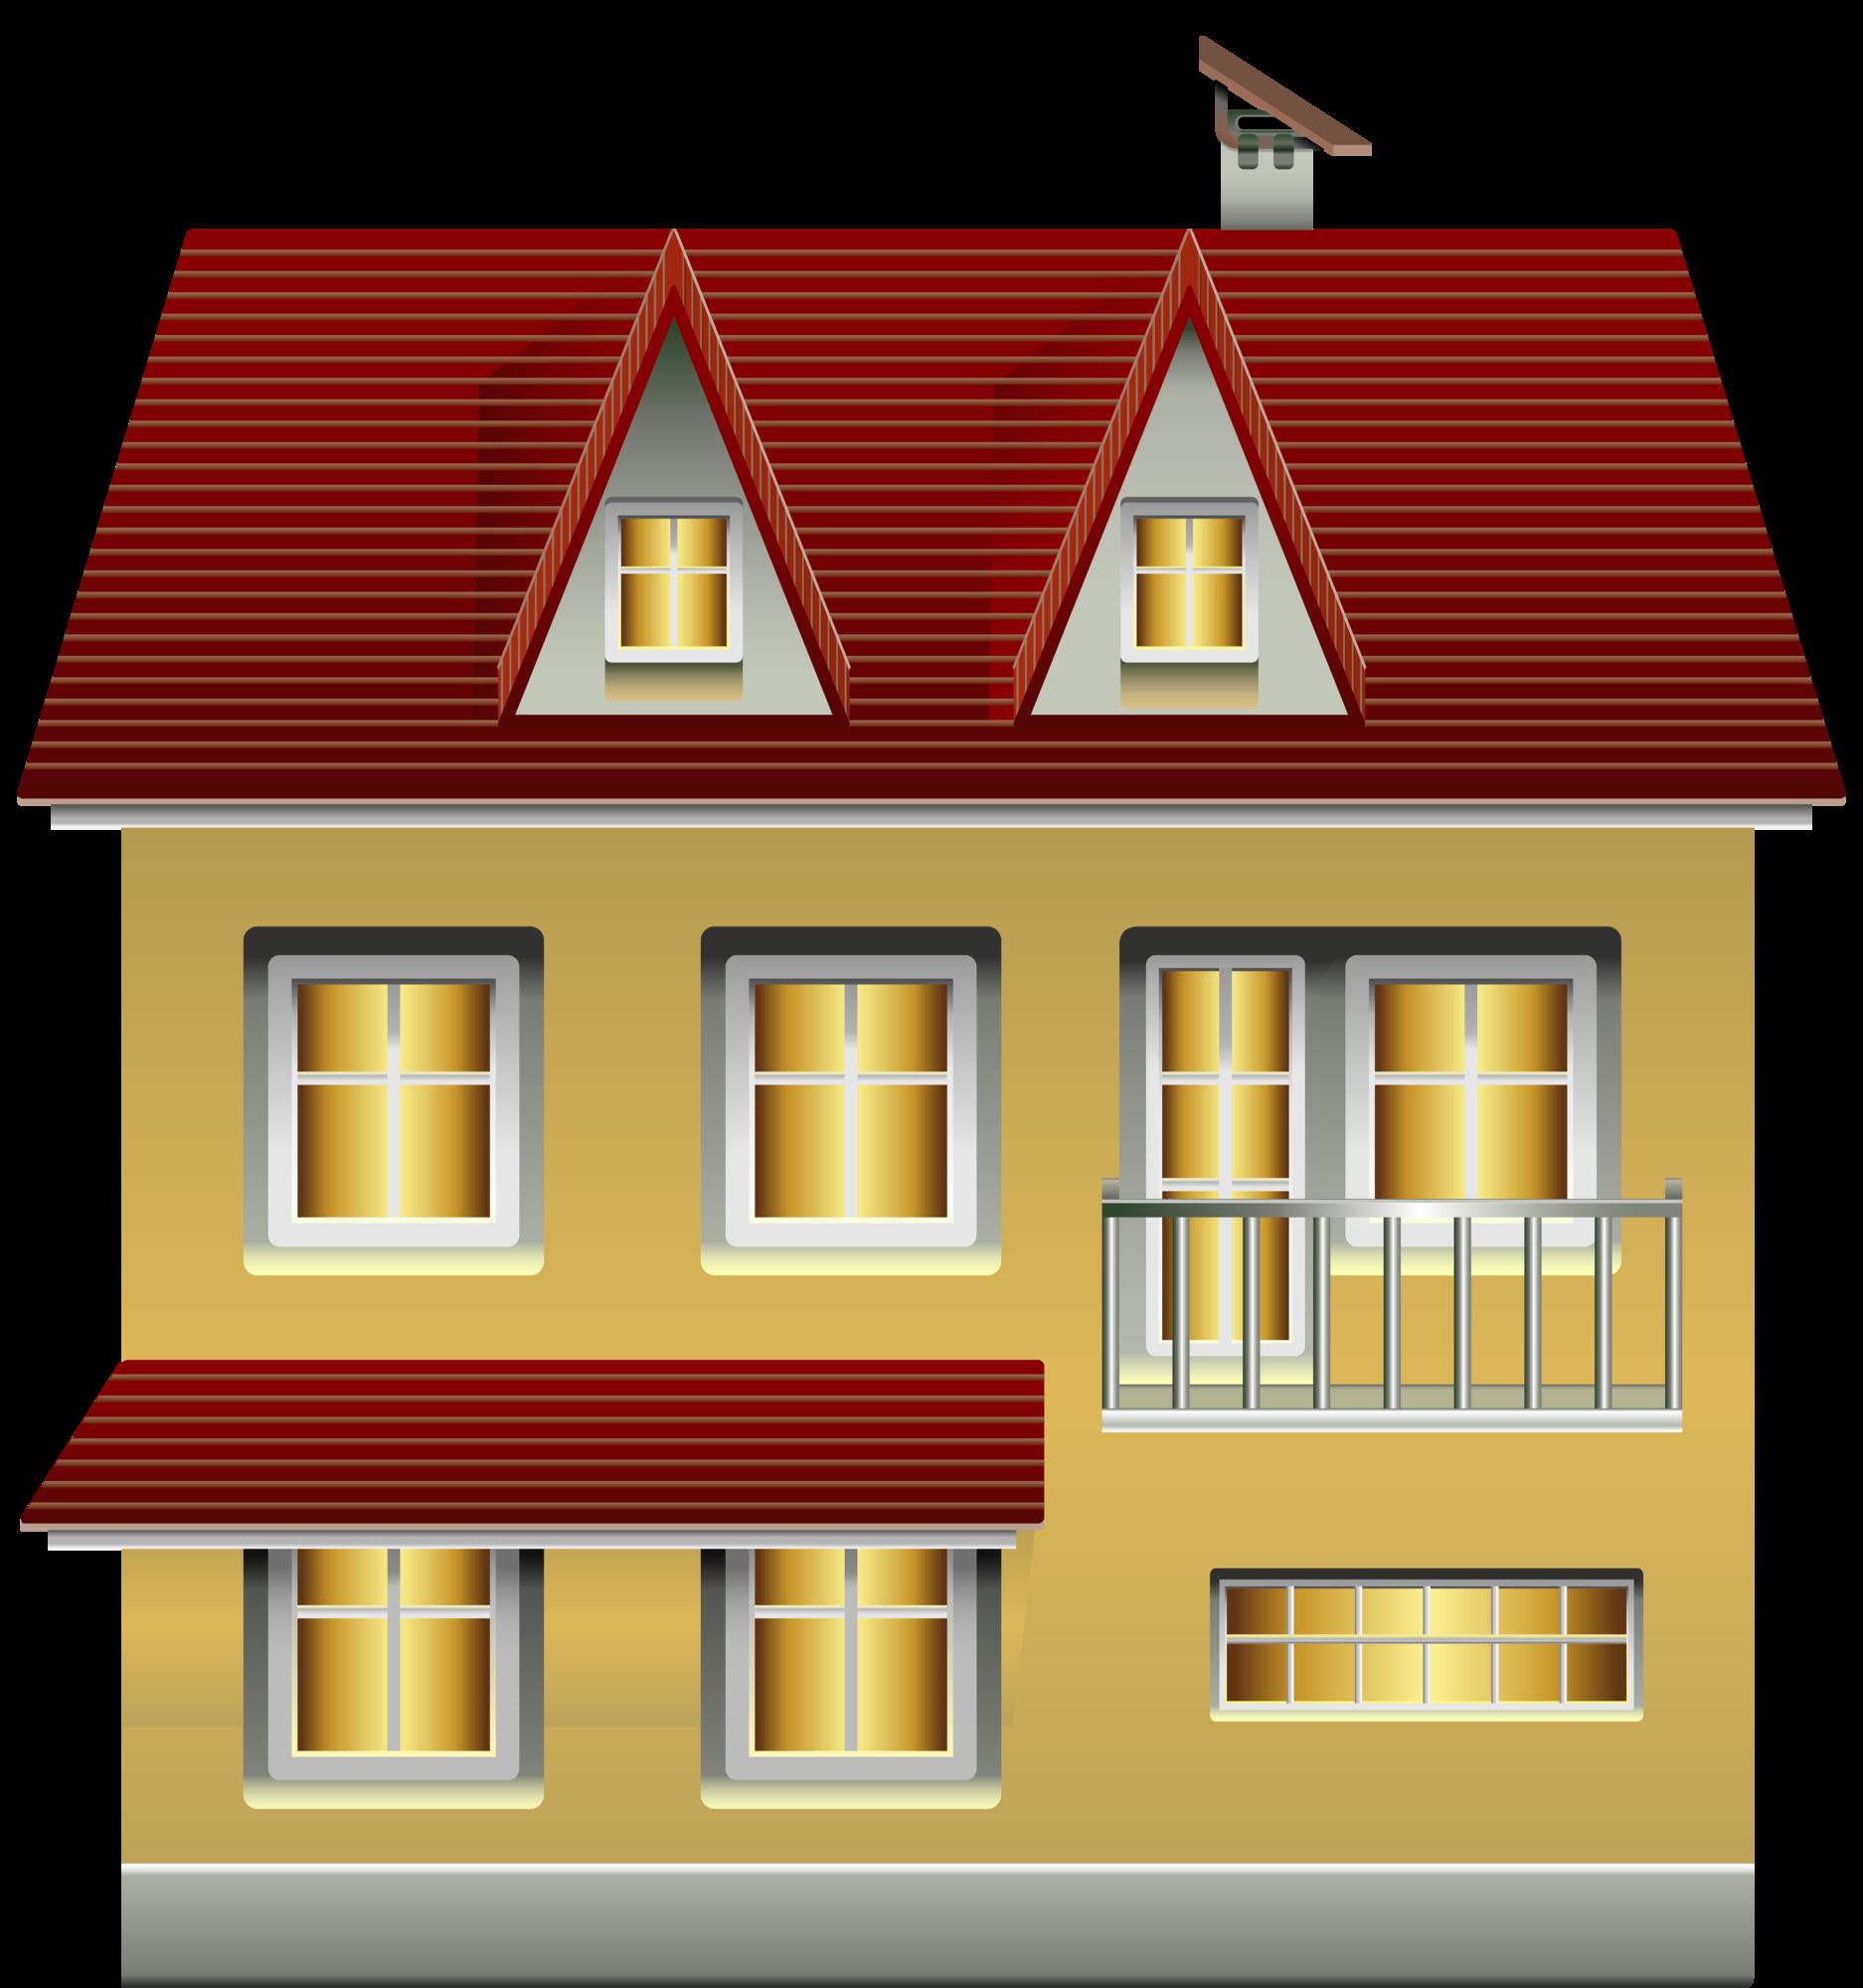 House clipart emoji. Yellow png clip art